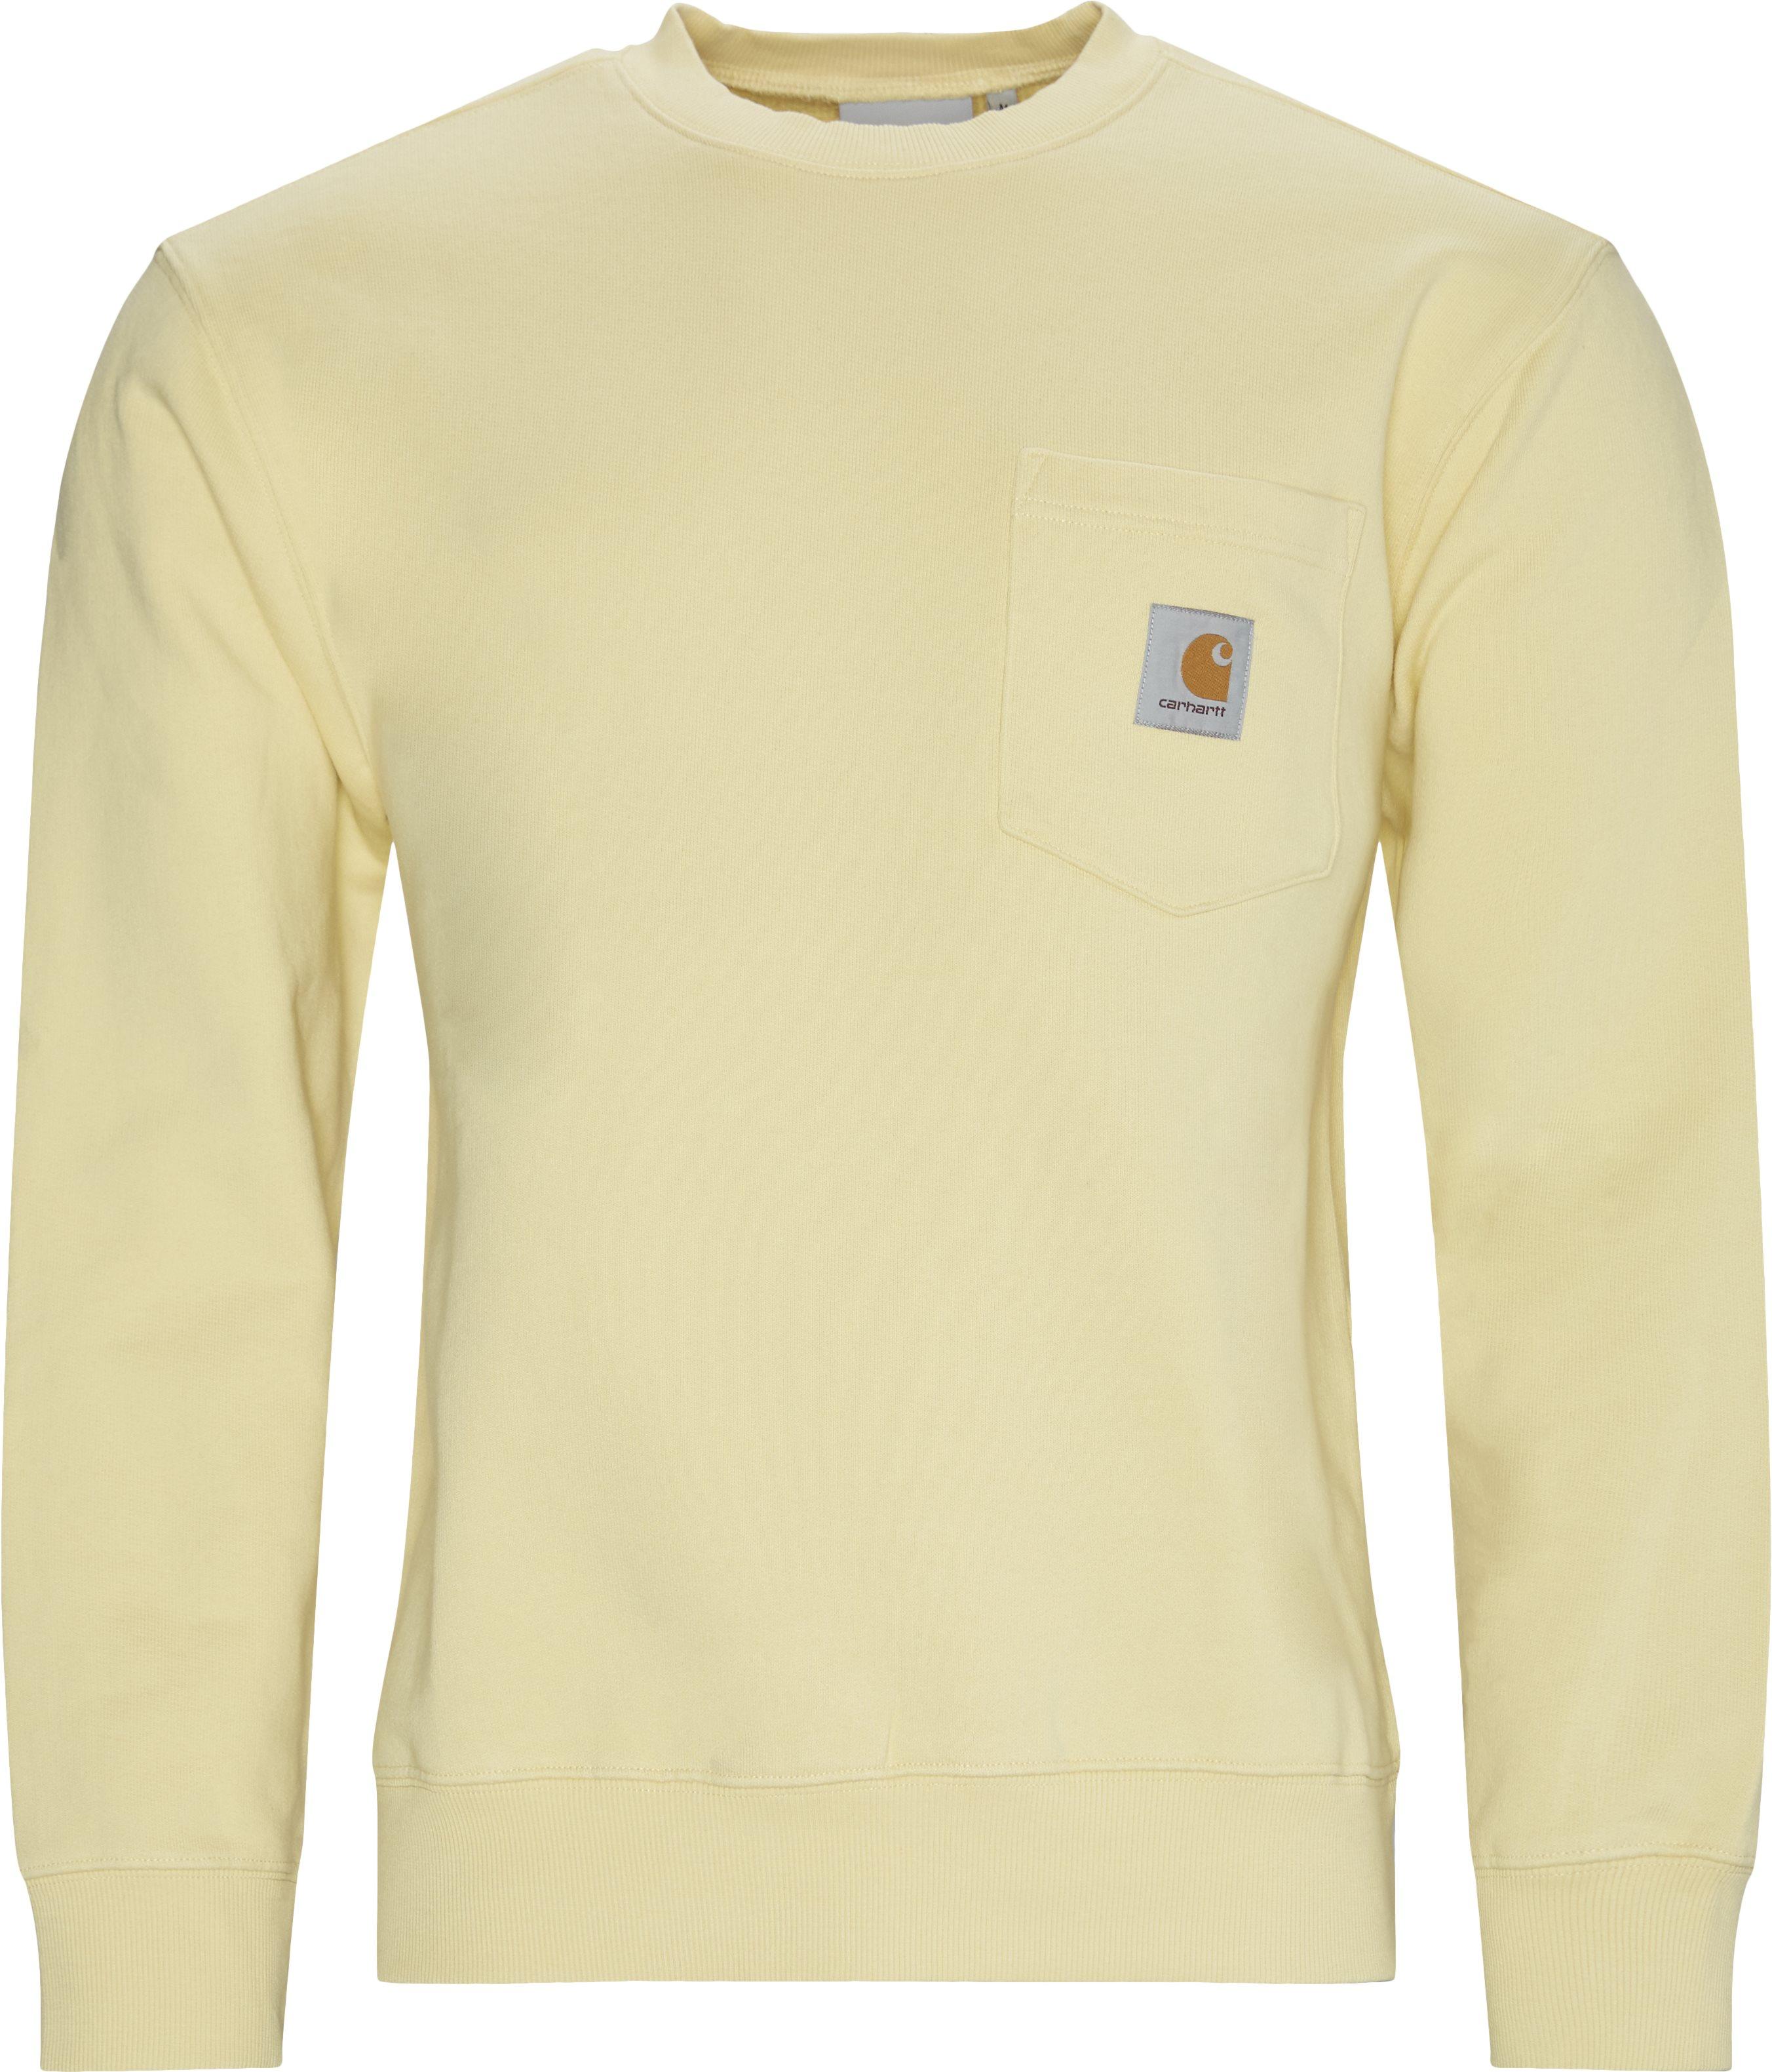 Sweatshirts - Regular - Yellow